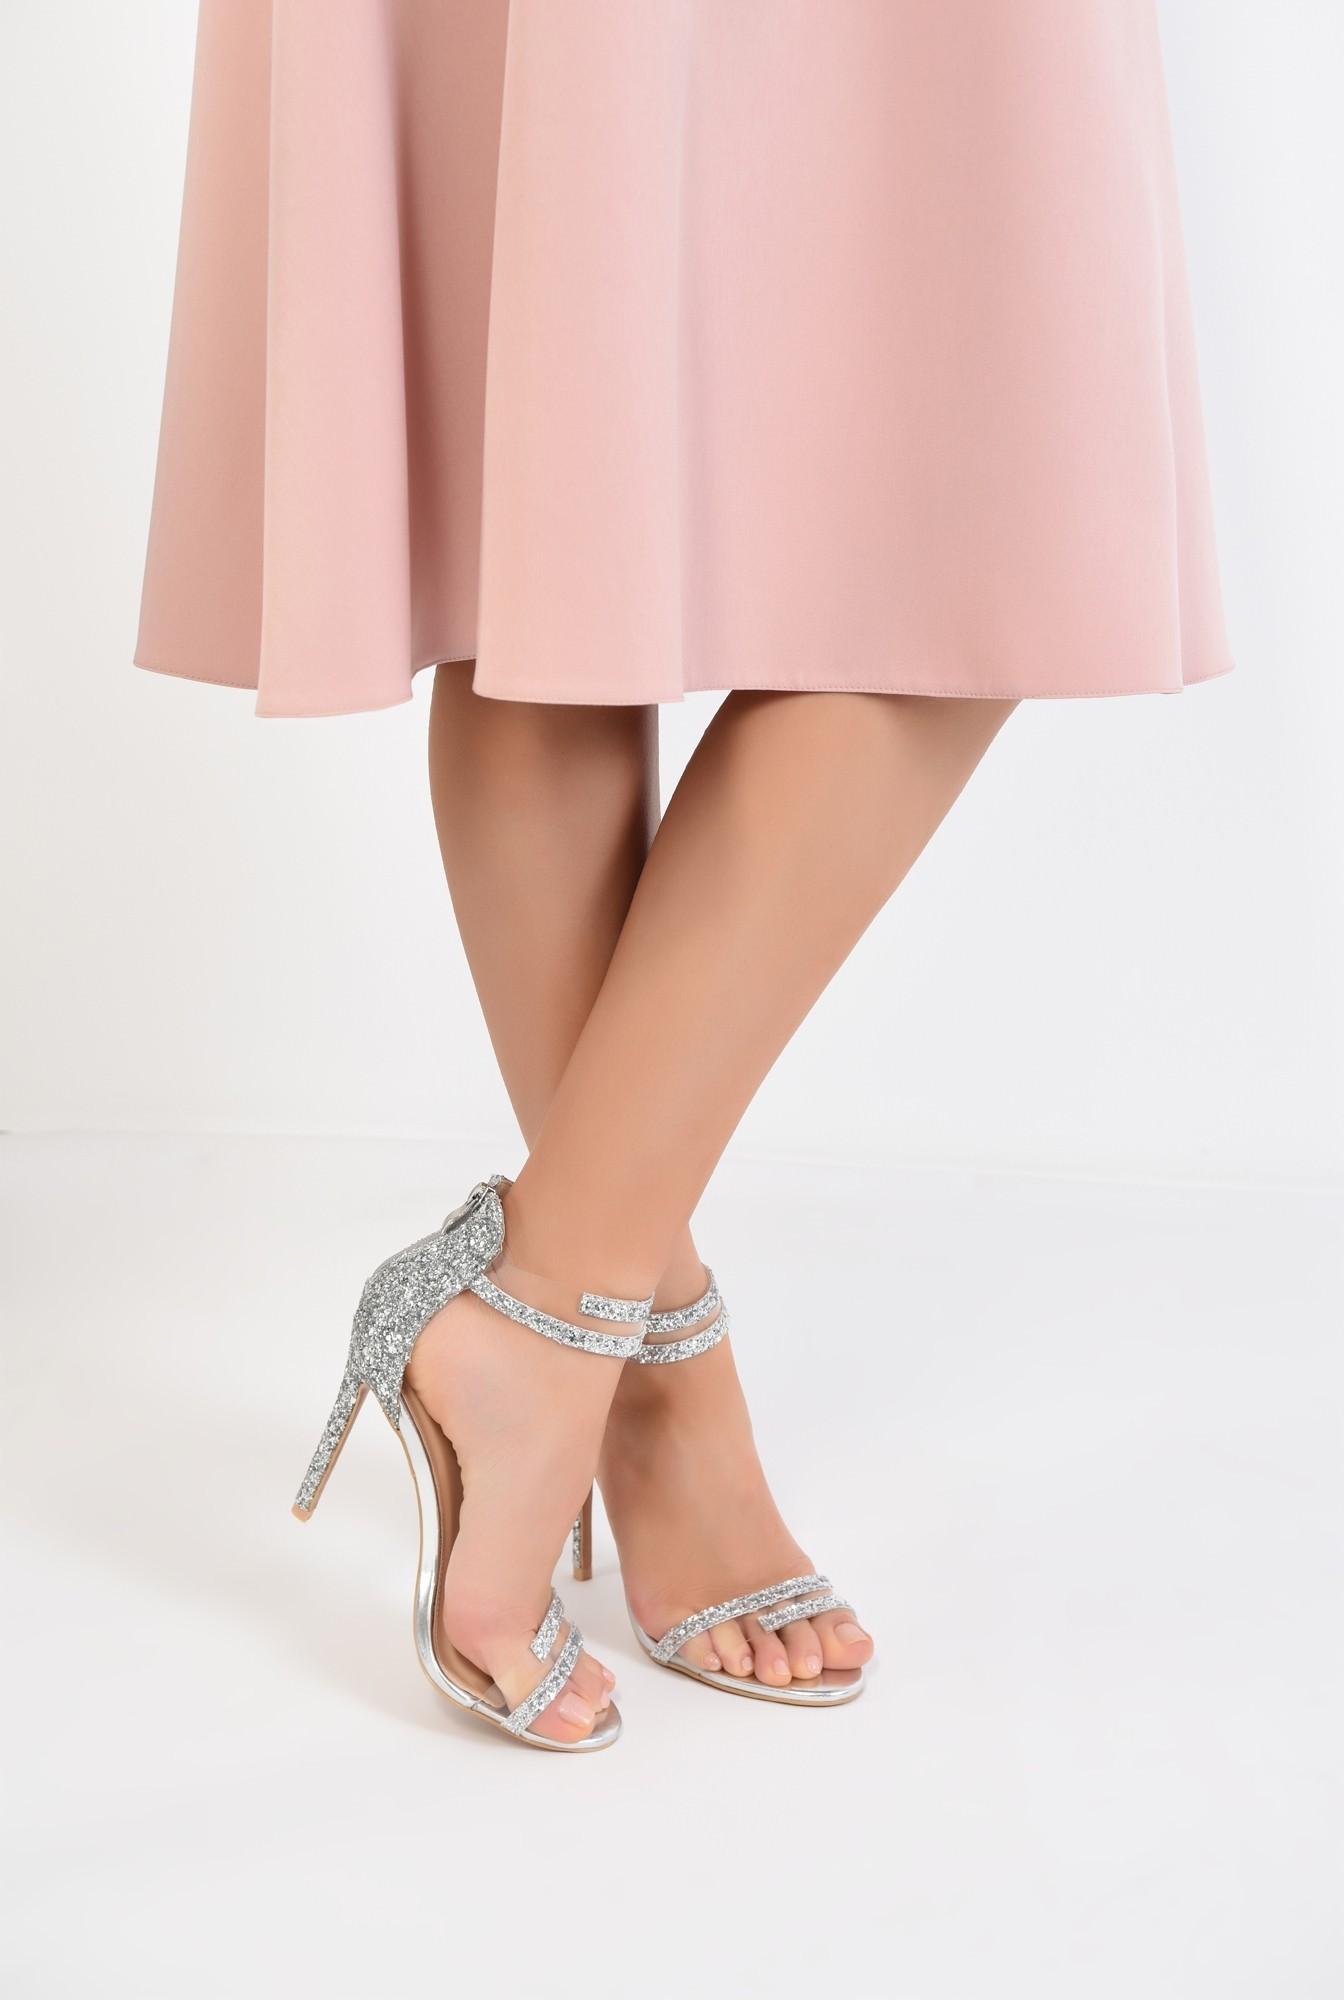 4 - sandale elegante, argintii, cu glitter, stiletto